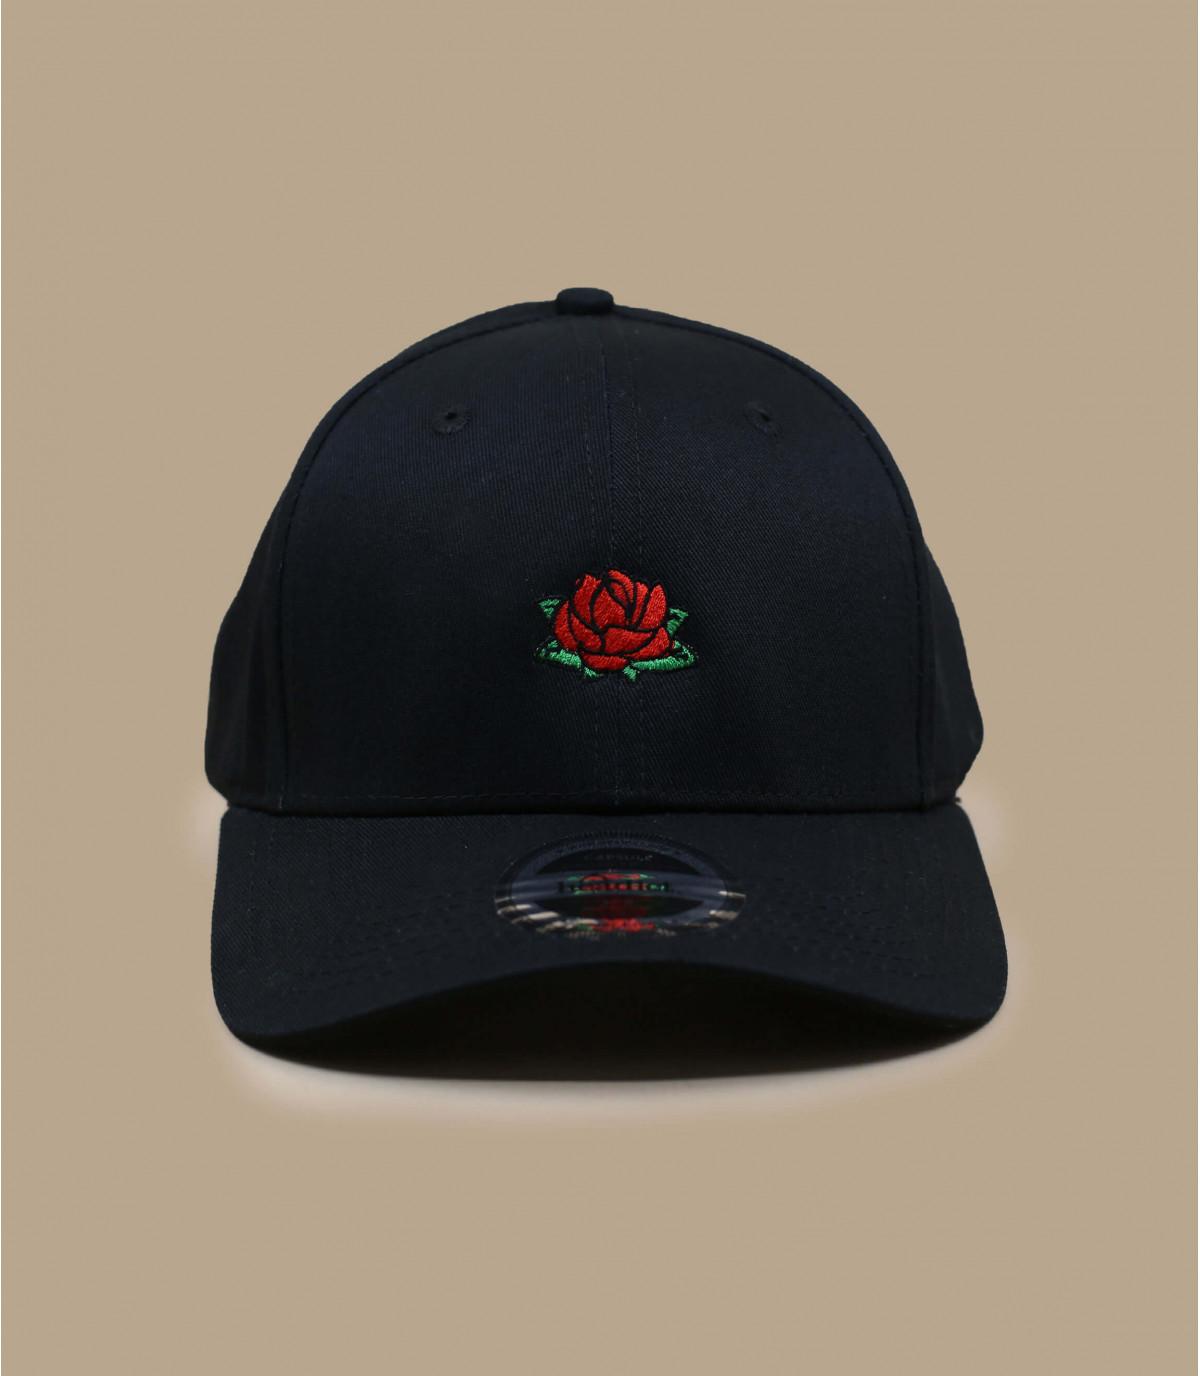 Details Curve Rose - Abbildung 3